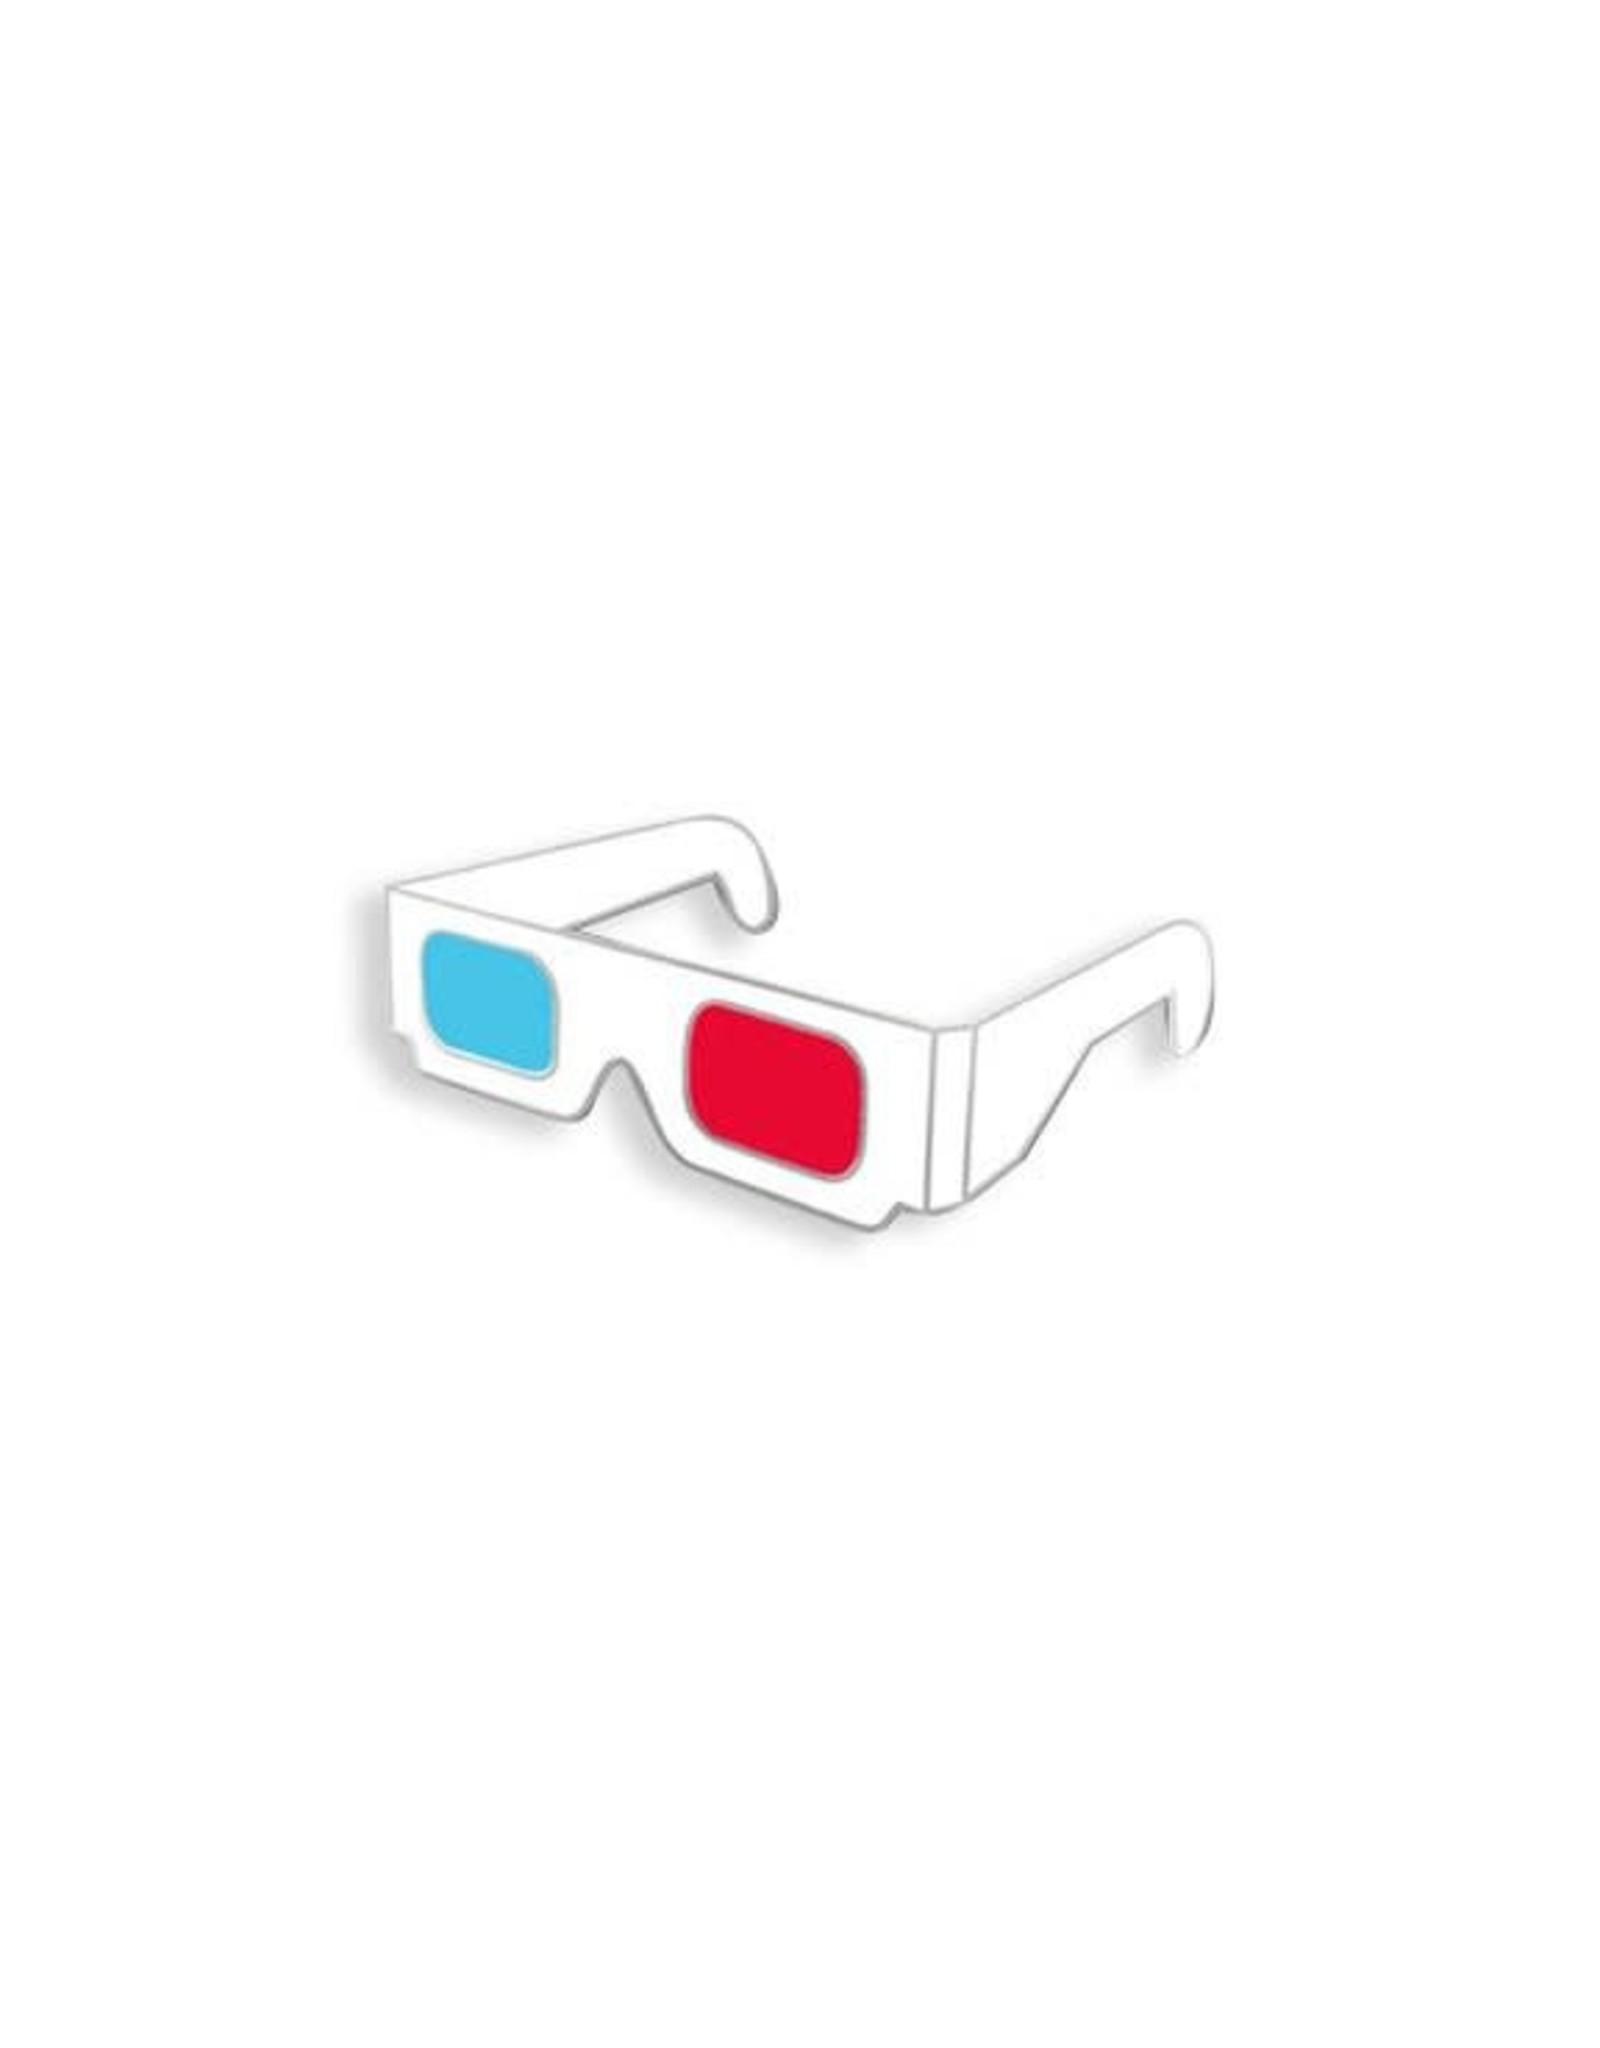 Enamel Pin 3D Glasses Enamel Pin